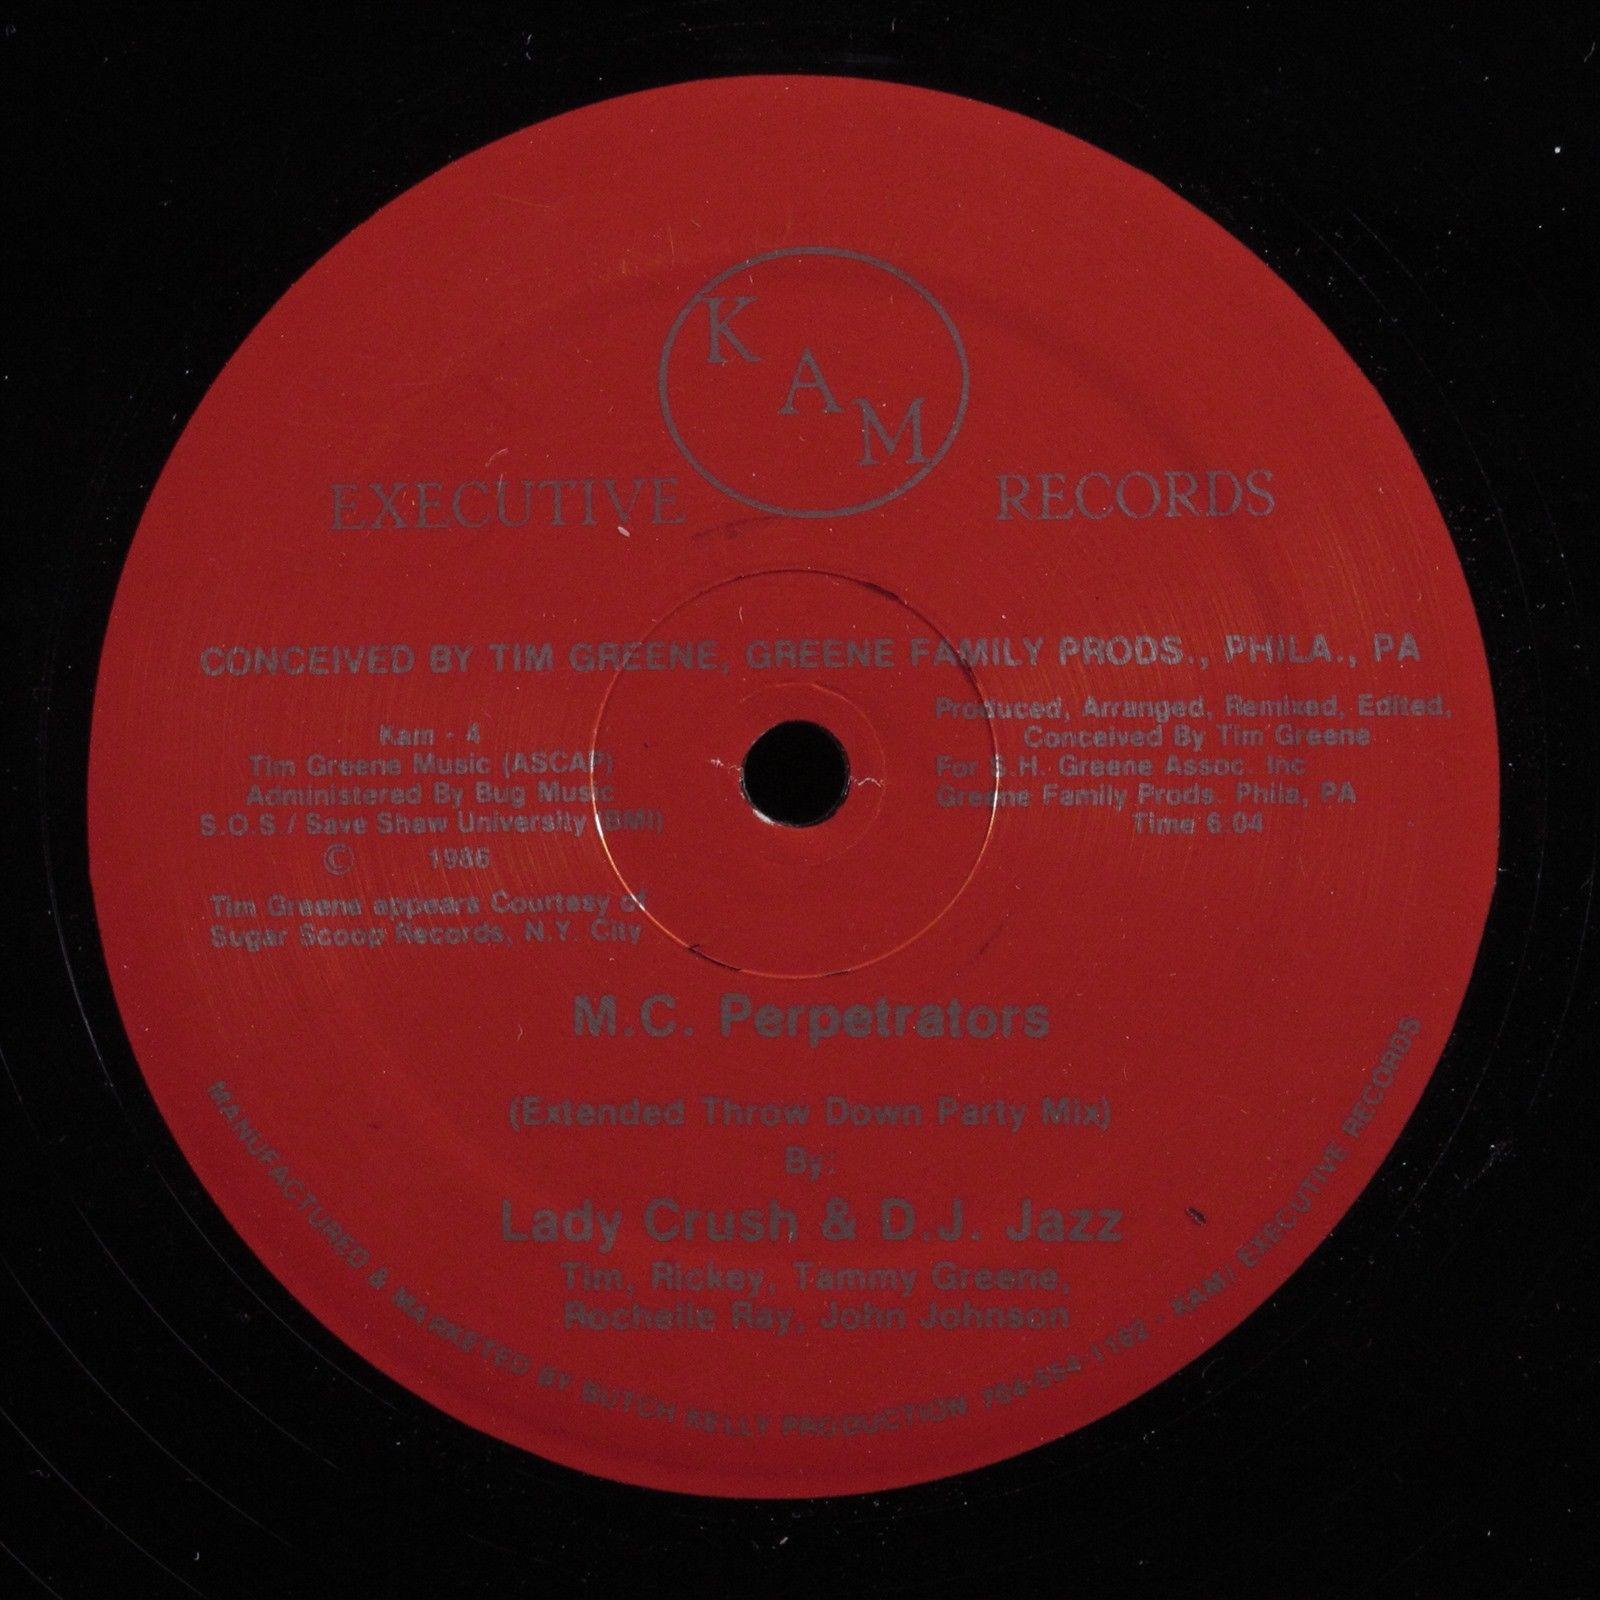 "LADY CRUSH & D.J. JAZZ M.C. Perpetrators EXECUTIVE KAM 12"" VG+ electro HEAR"